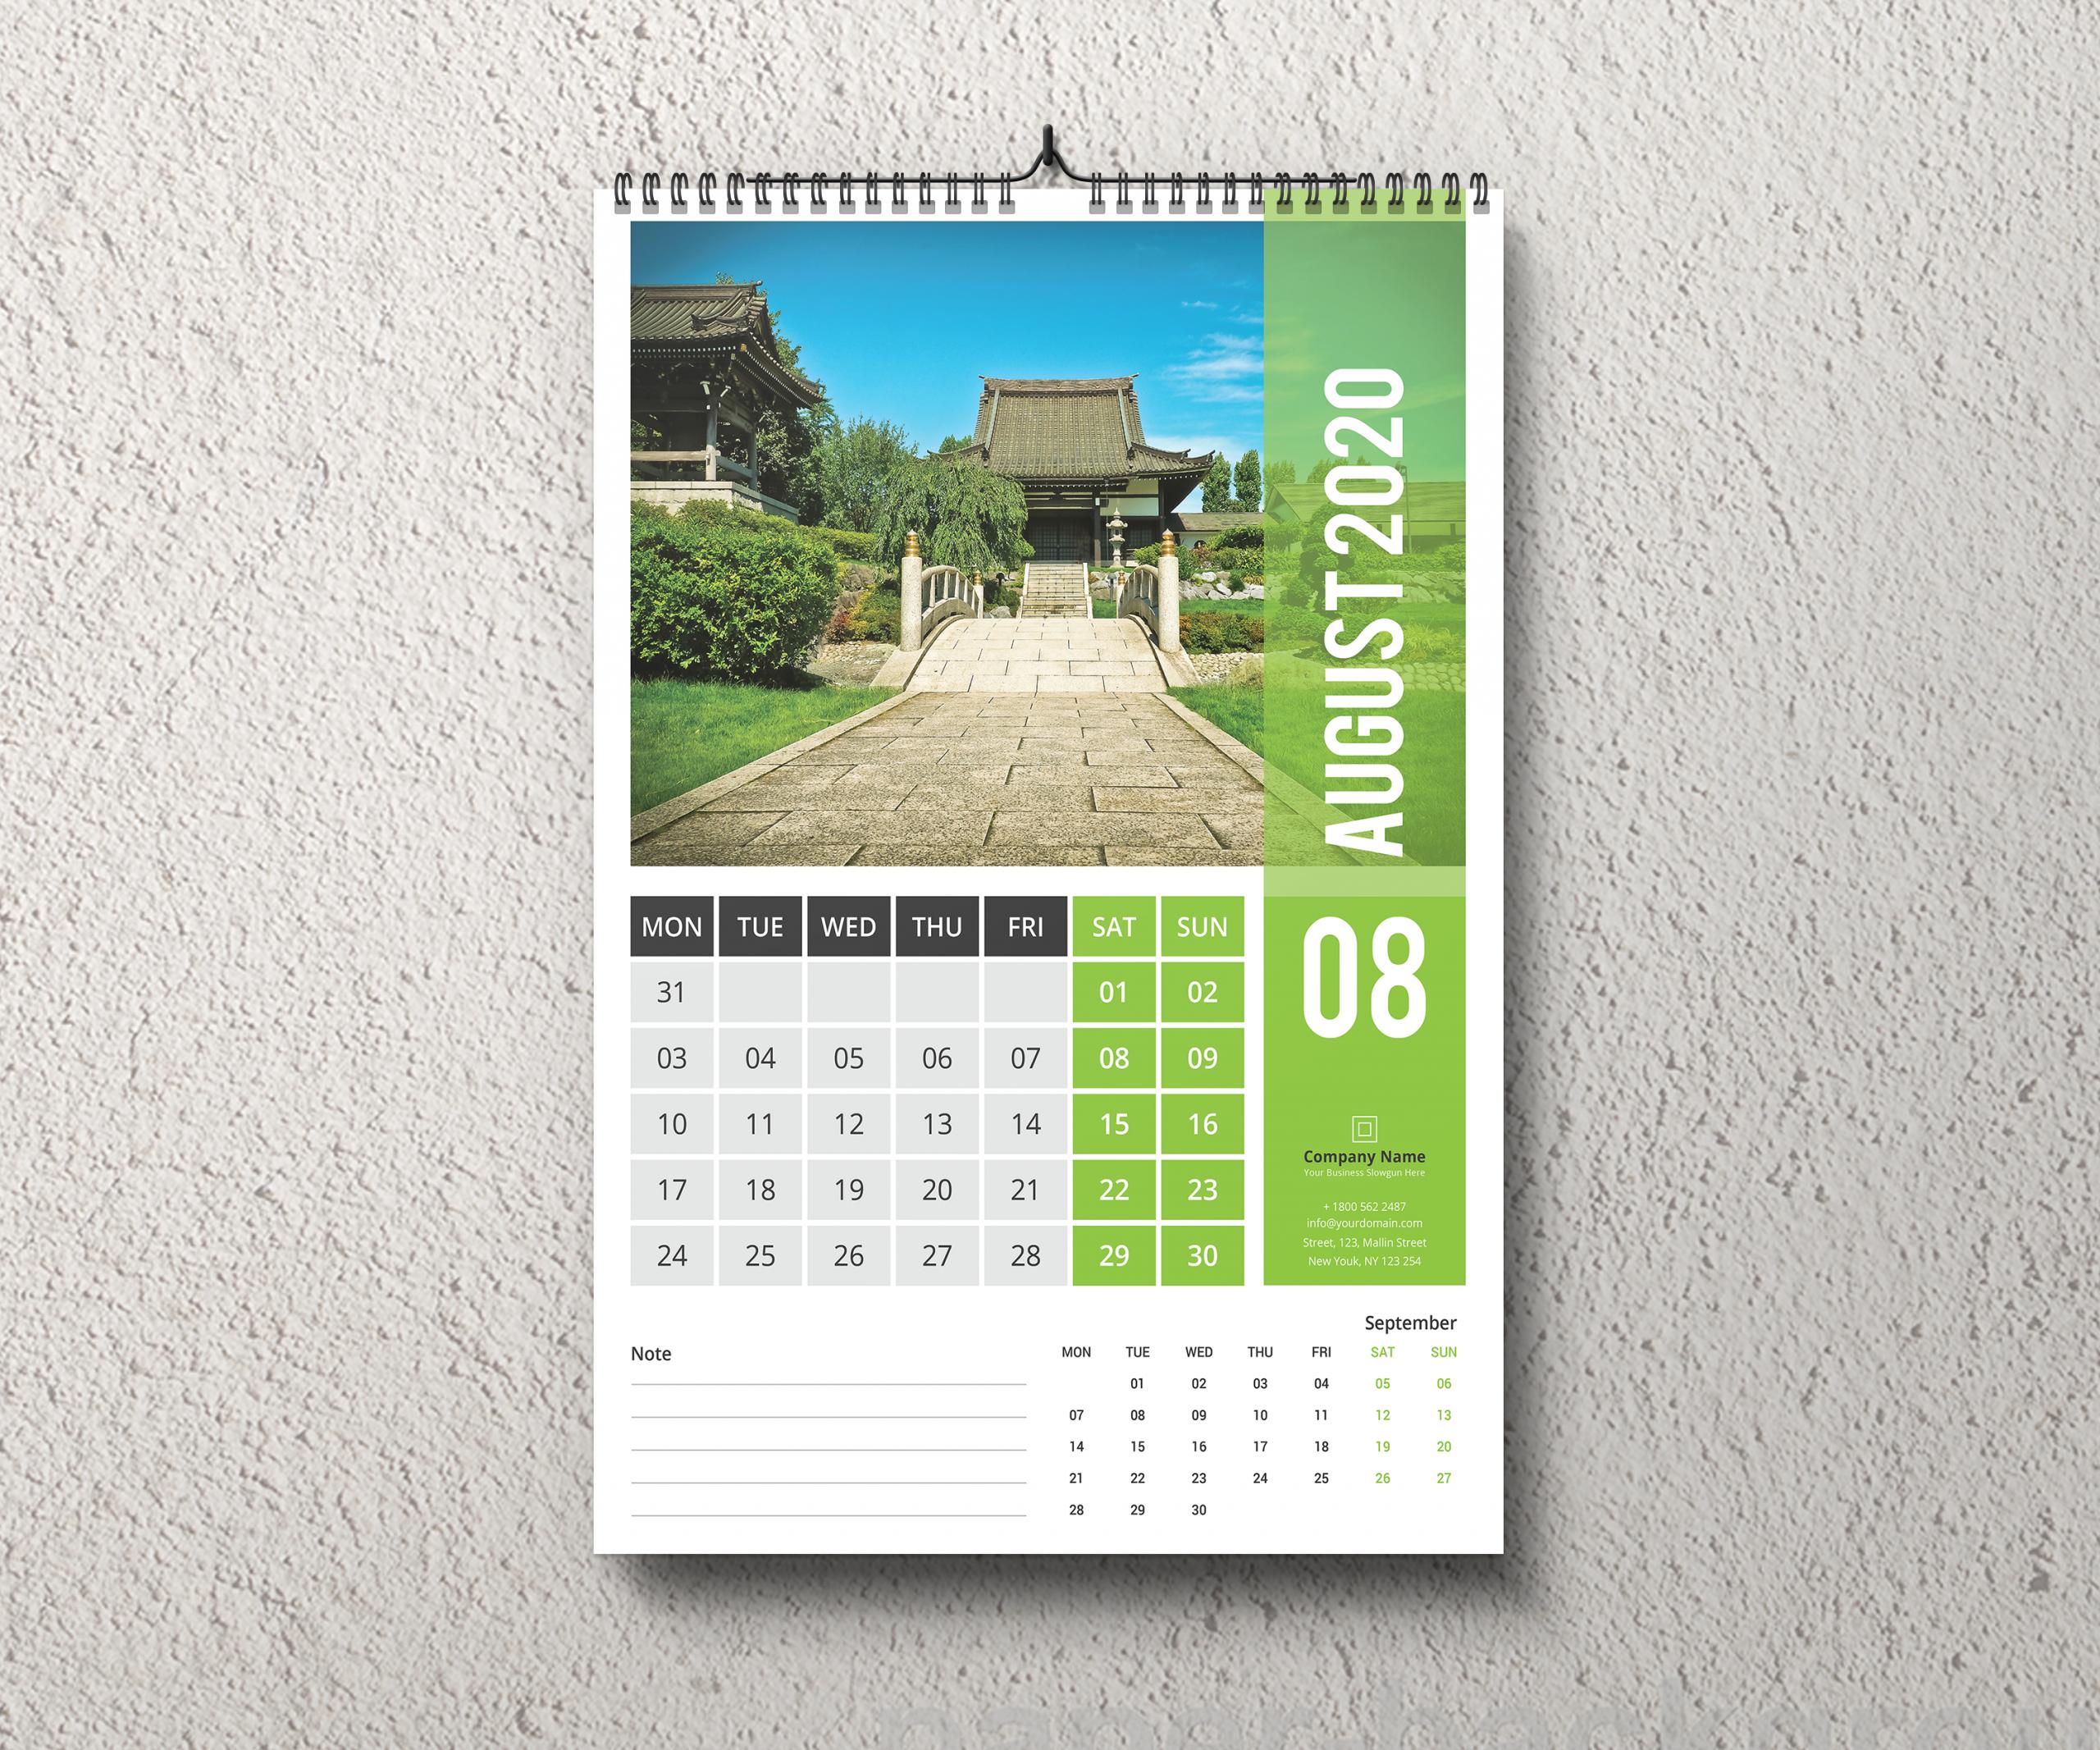 Wall Calendar 2020 #wallcalendar #calendar #calendar2020